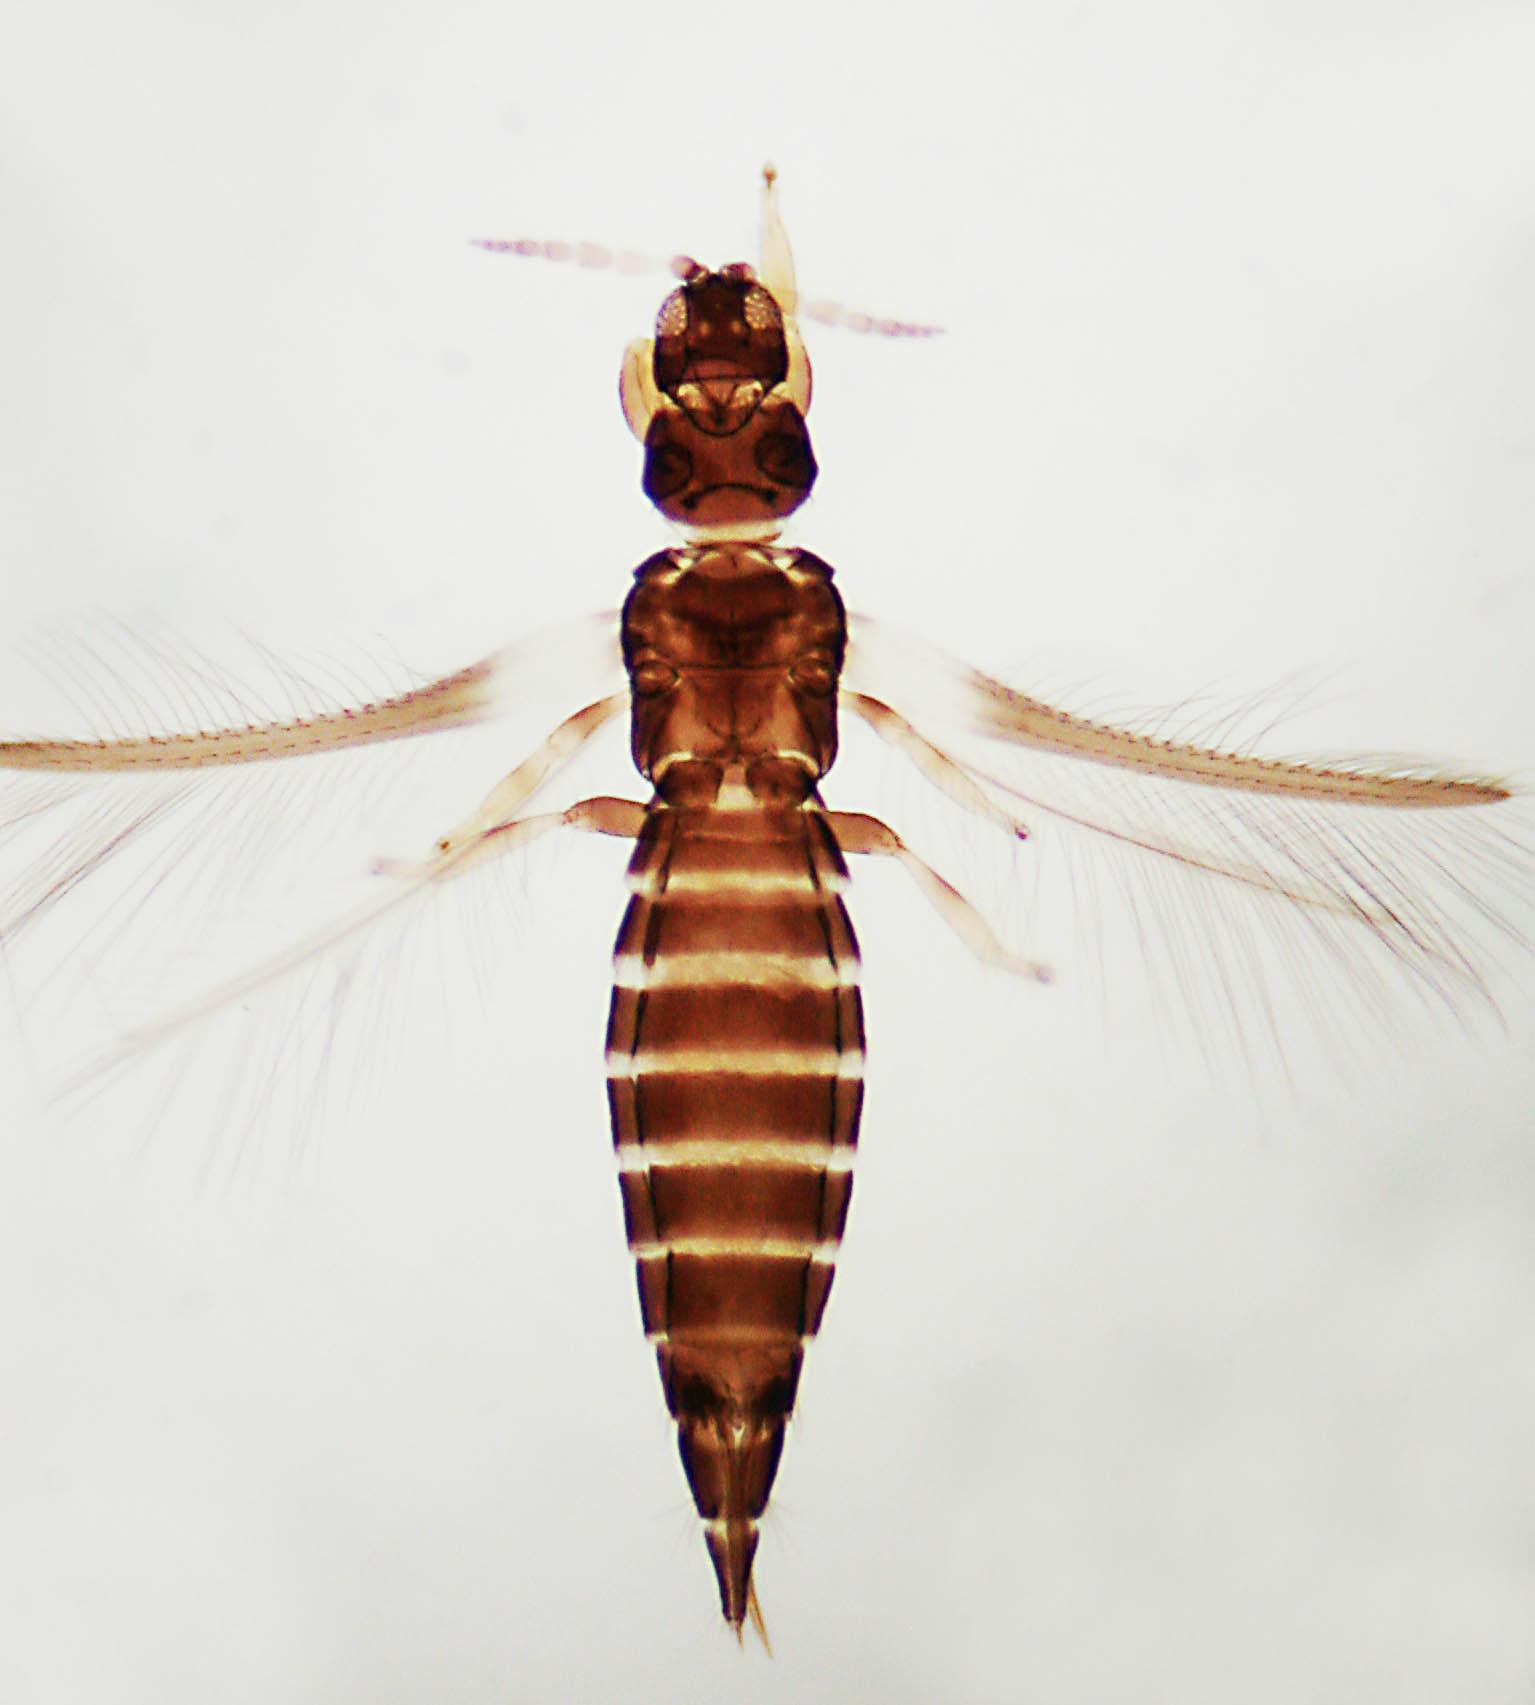 Heterothrips sanctaecatharinae